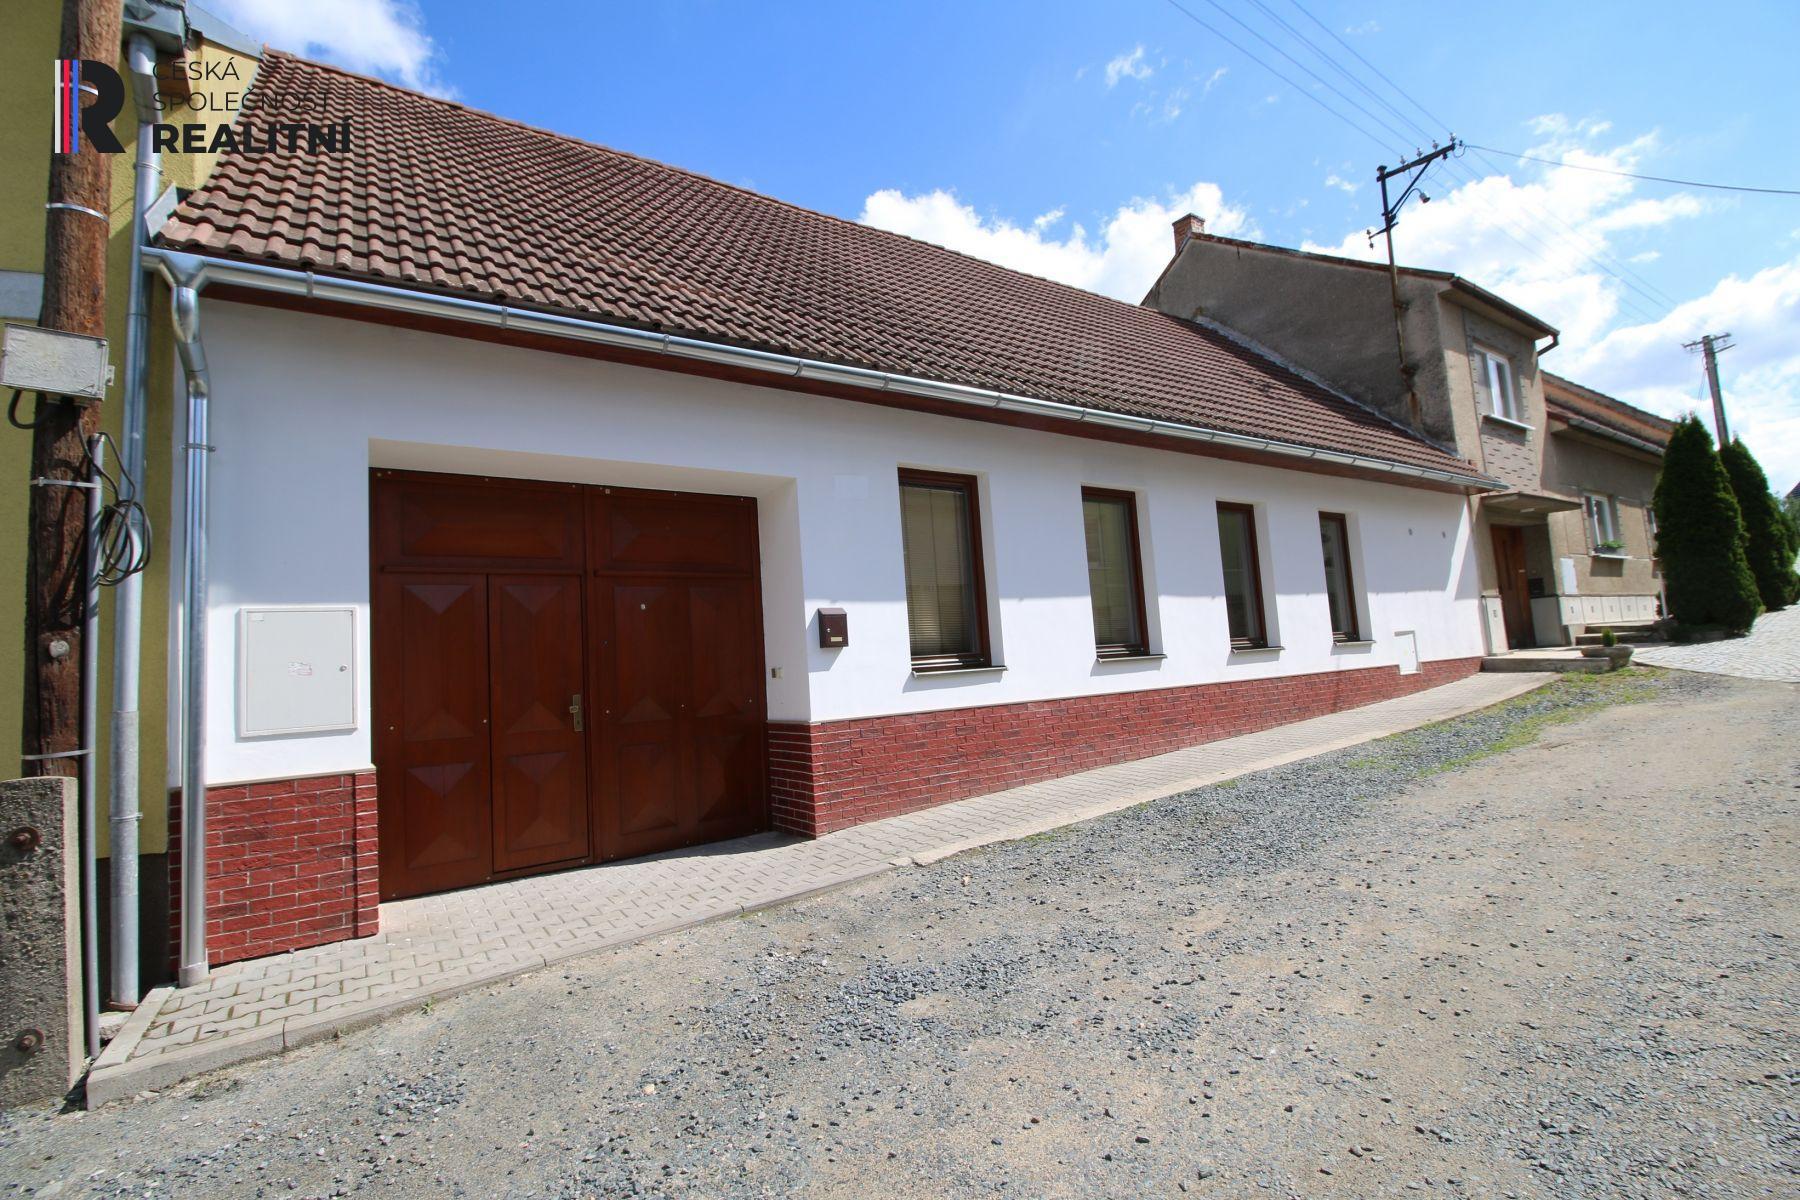 Prodej rodinného domu 4 kk , 152m2 + dvůr, garáže, dílny 190m2 + zahrada 1123m2